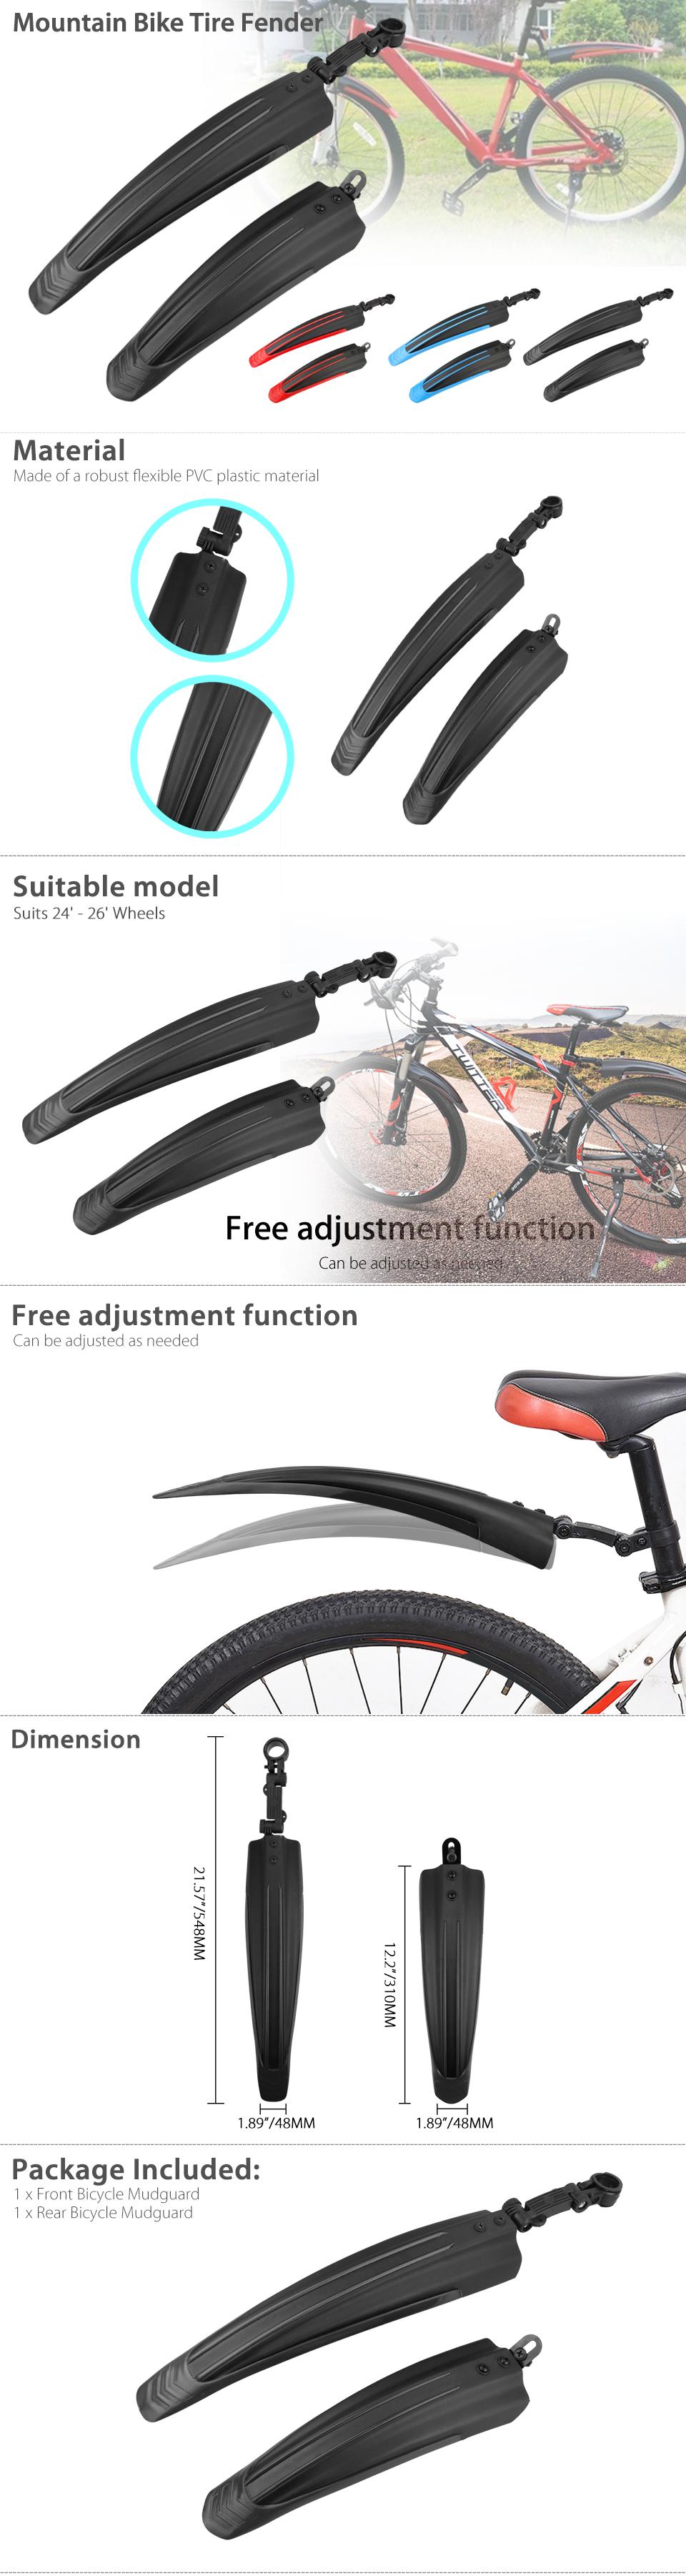 Bicycle Mountain Bike Front /& Rear Mudguard Set Flexible PVC Plastic Cycling